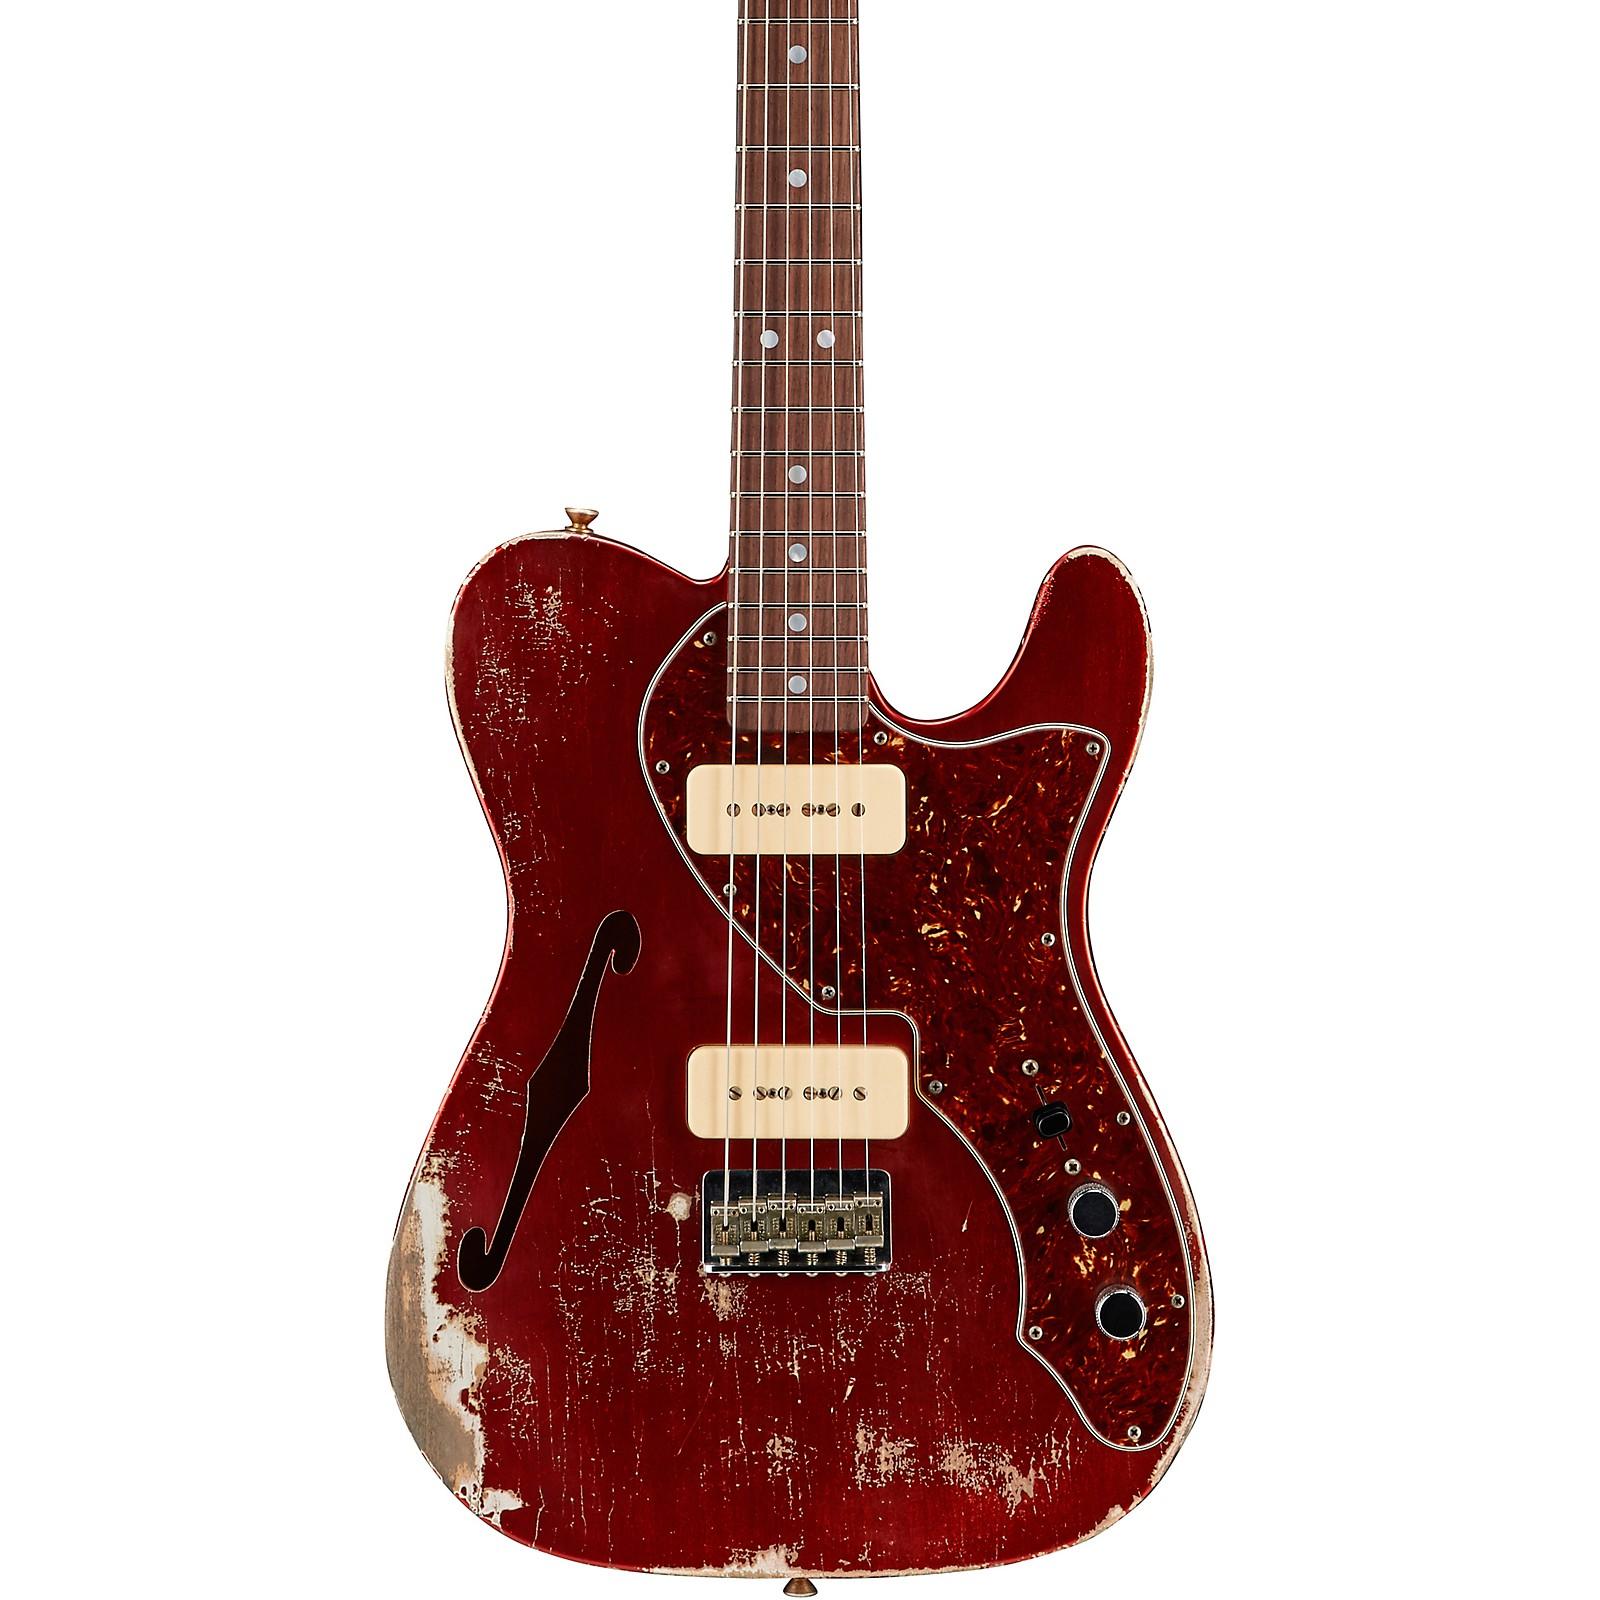 Fender Custom Shop '68 Thinline Telecaster Relic Electric Guitar Masterbuilt by Greg Fessler